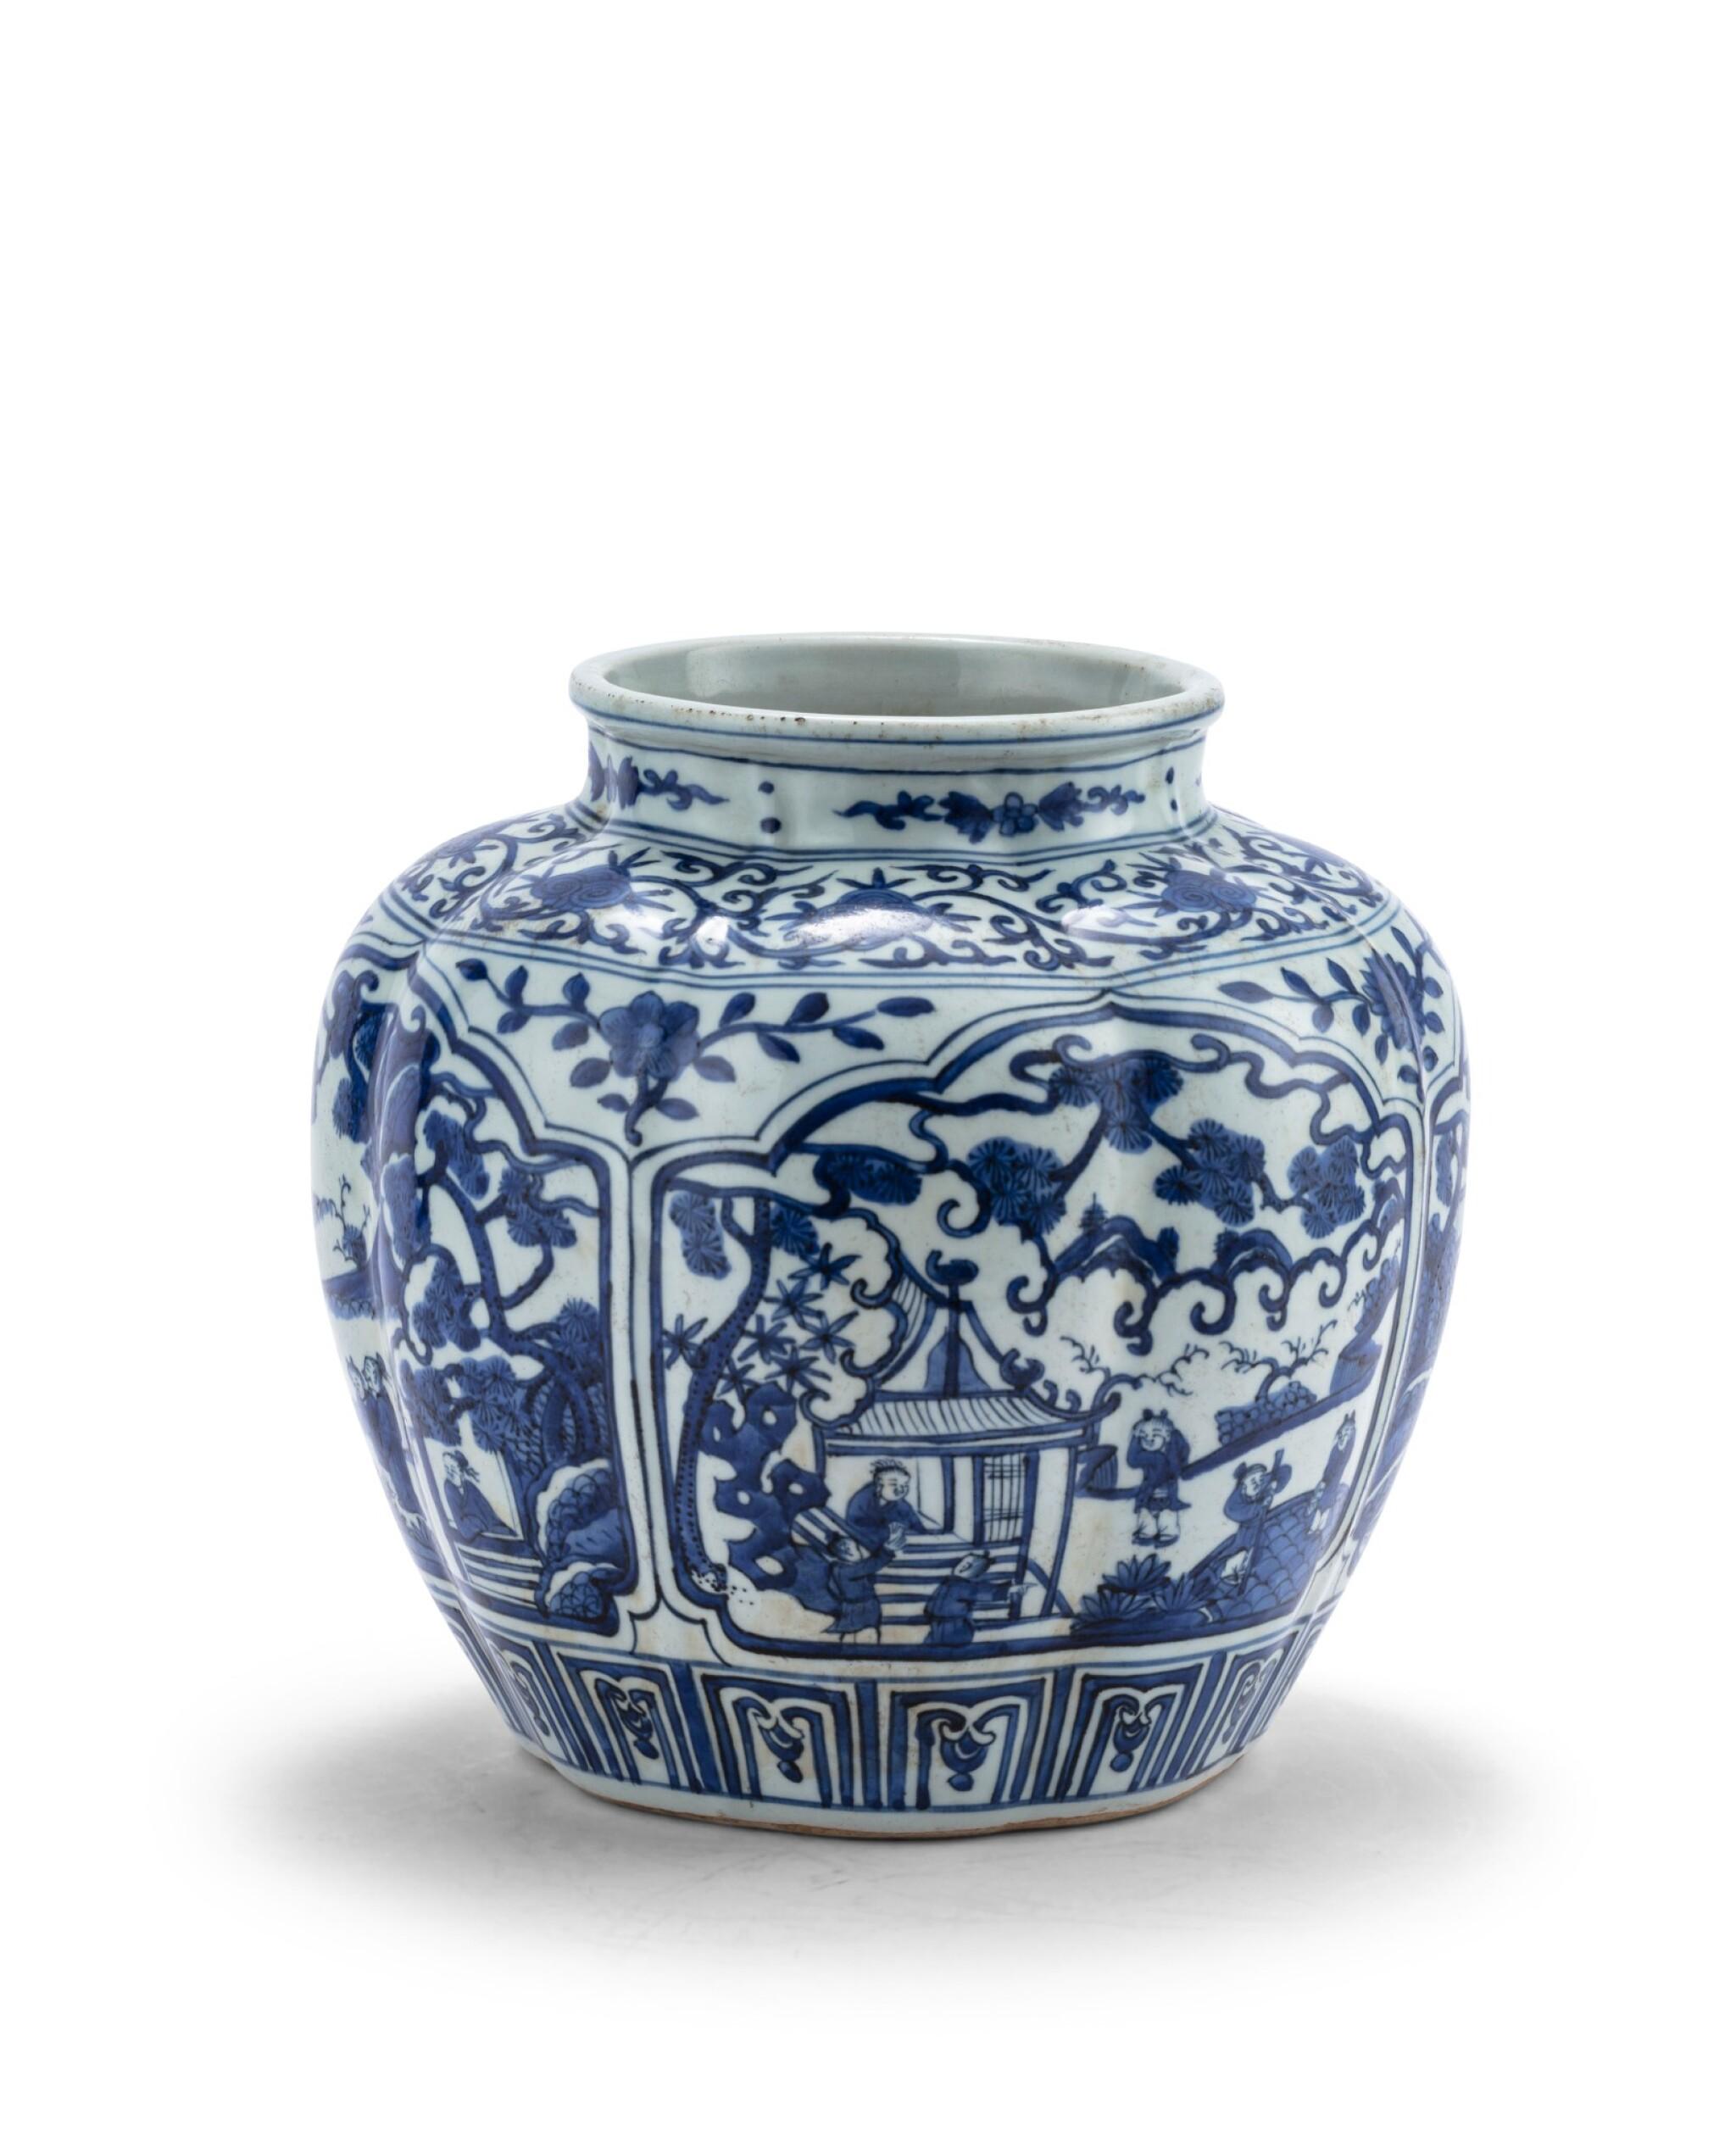 View 1 of Lot 188. Vase en porcelaine bleu blanc Marque et époque Jiajing | 明嘉靖 青花開光人物故事圖罐   《大明嘉靖年製》款 | A blue and white jar, mark and period of Jiajing .